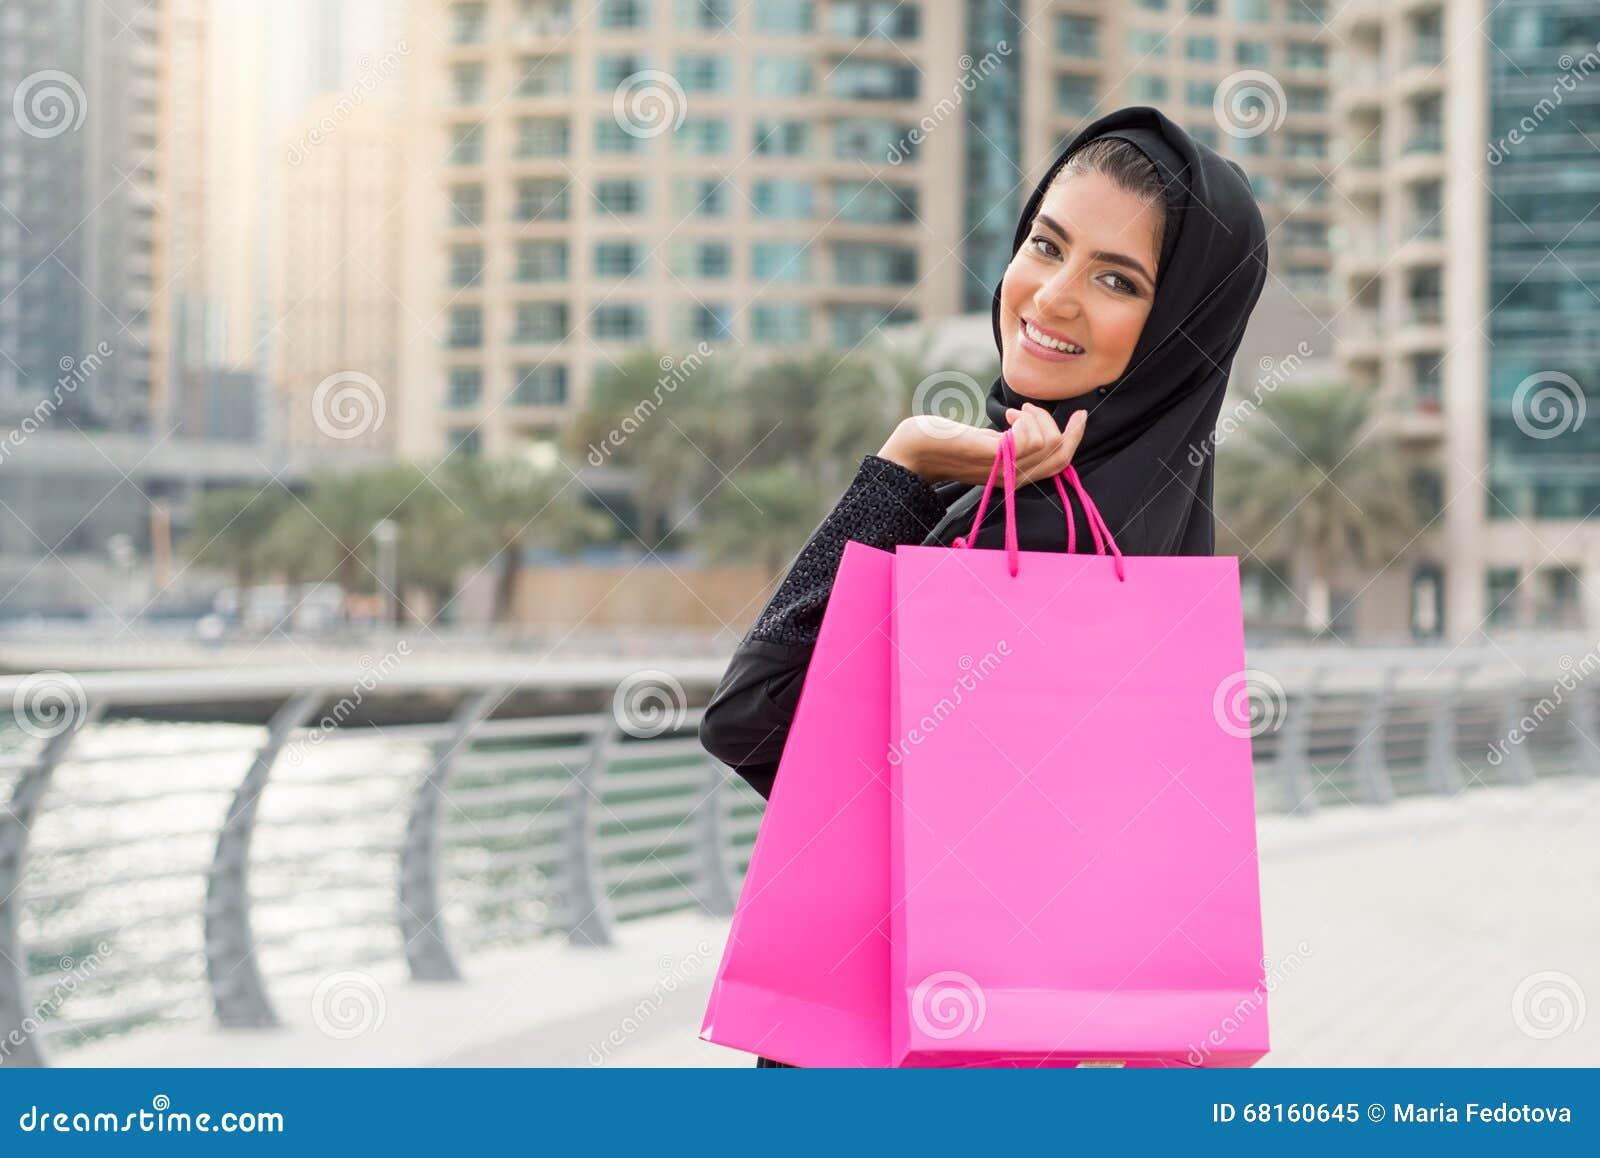 Compra árabe da mulher